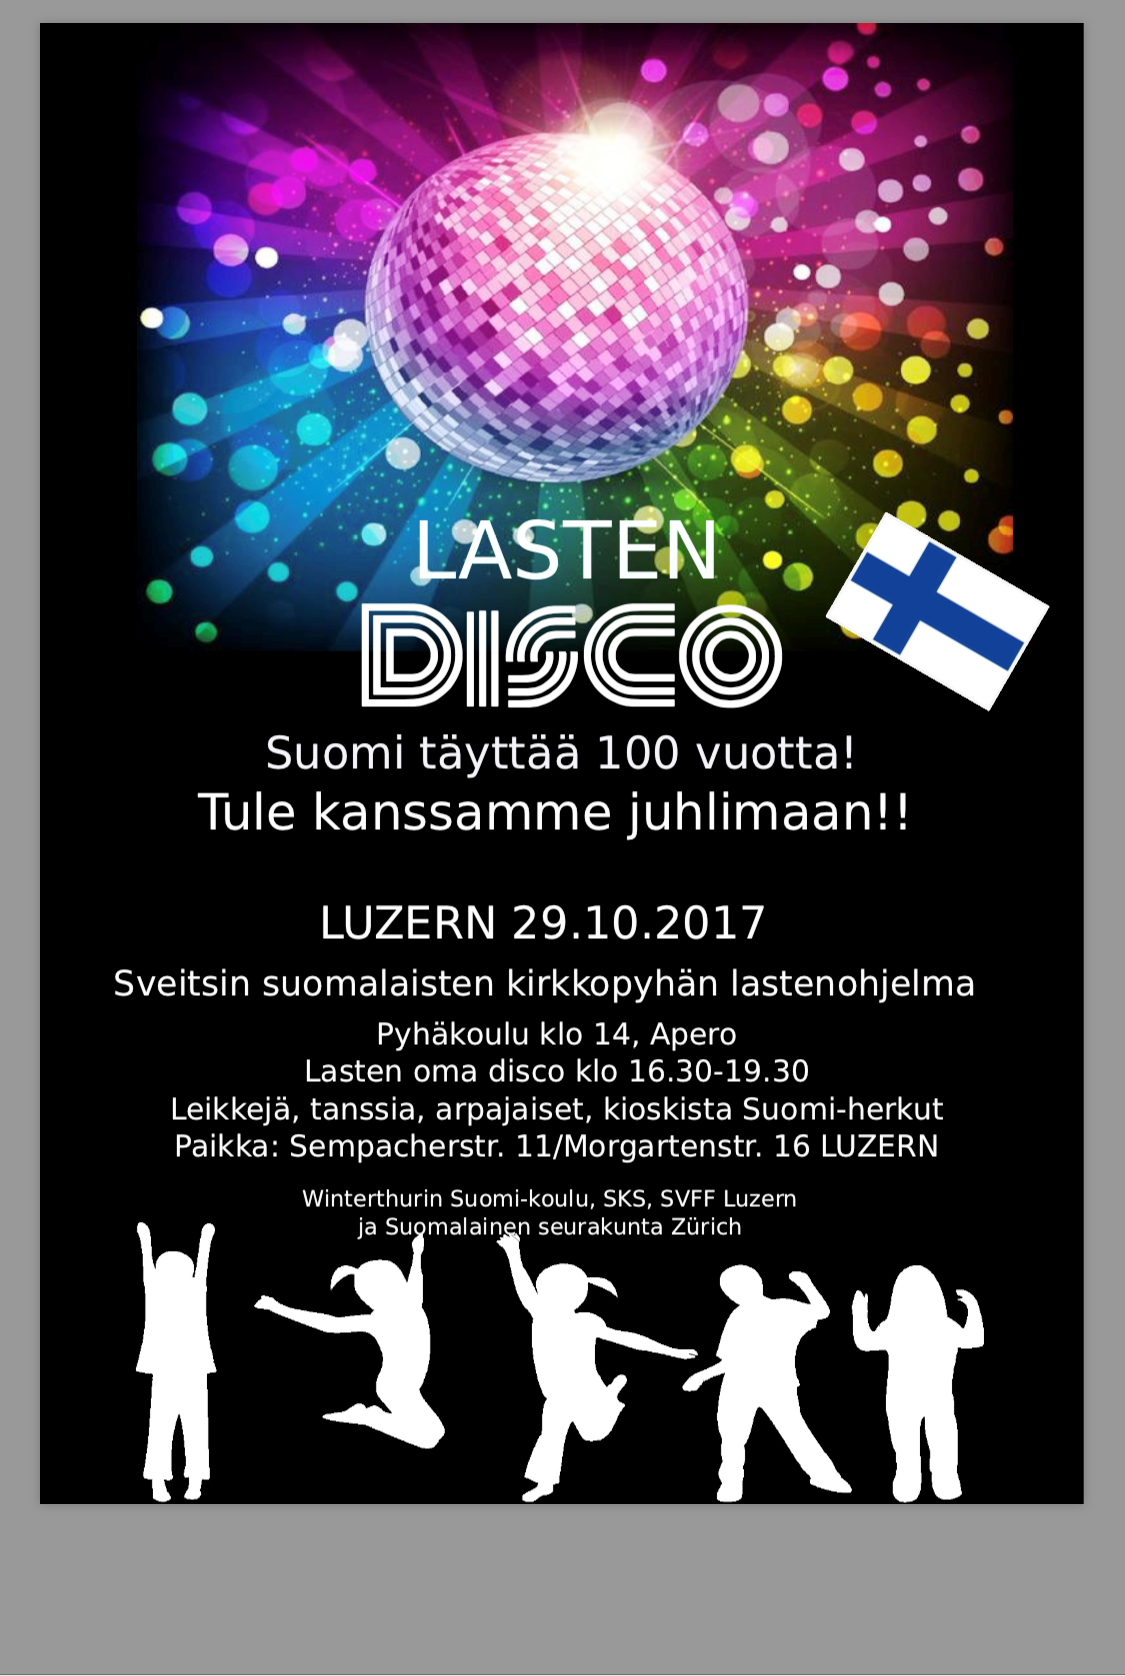 Lasten disco